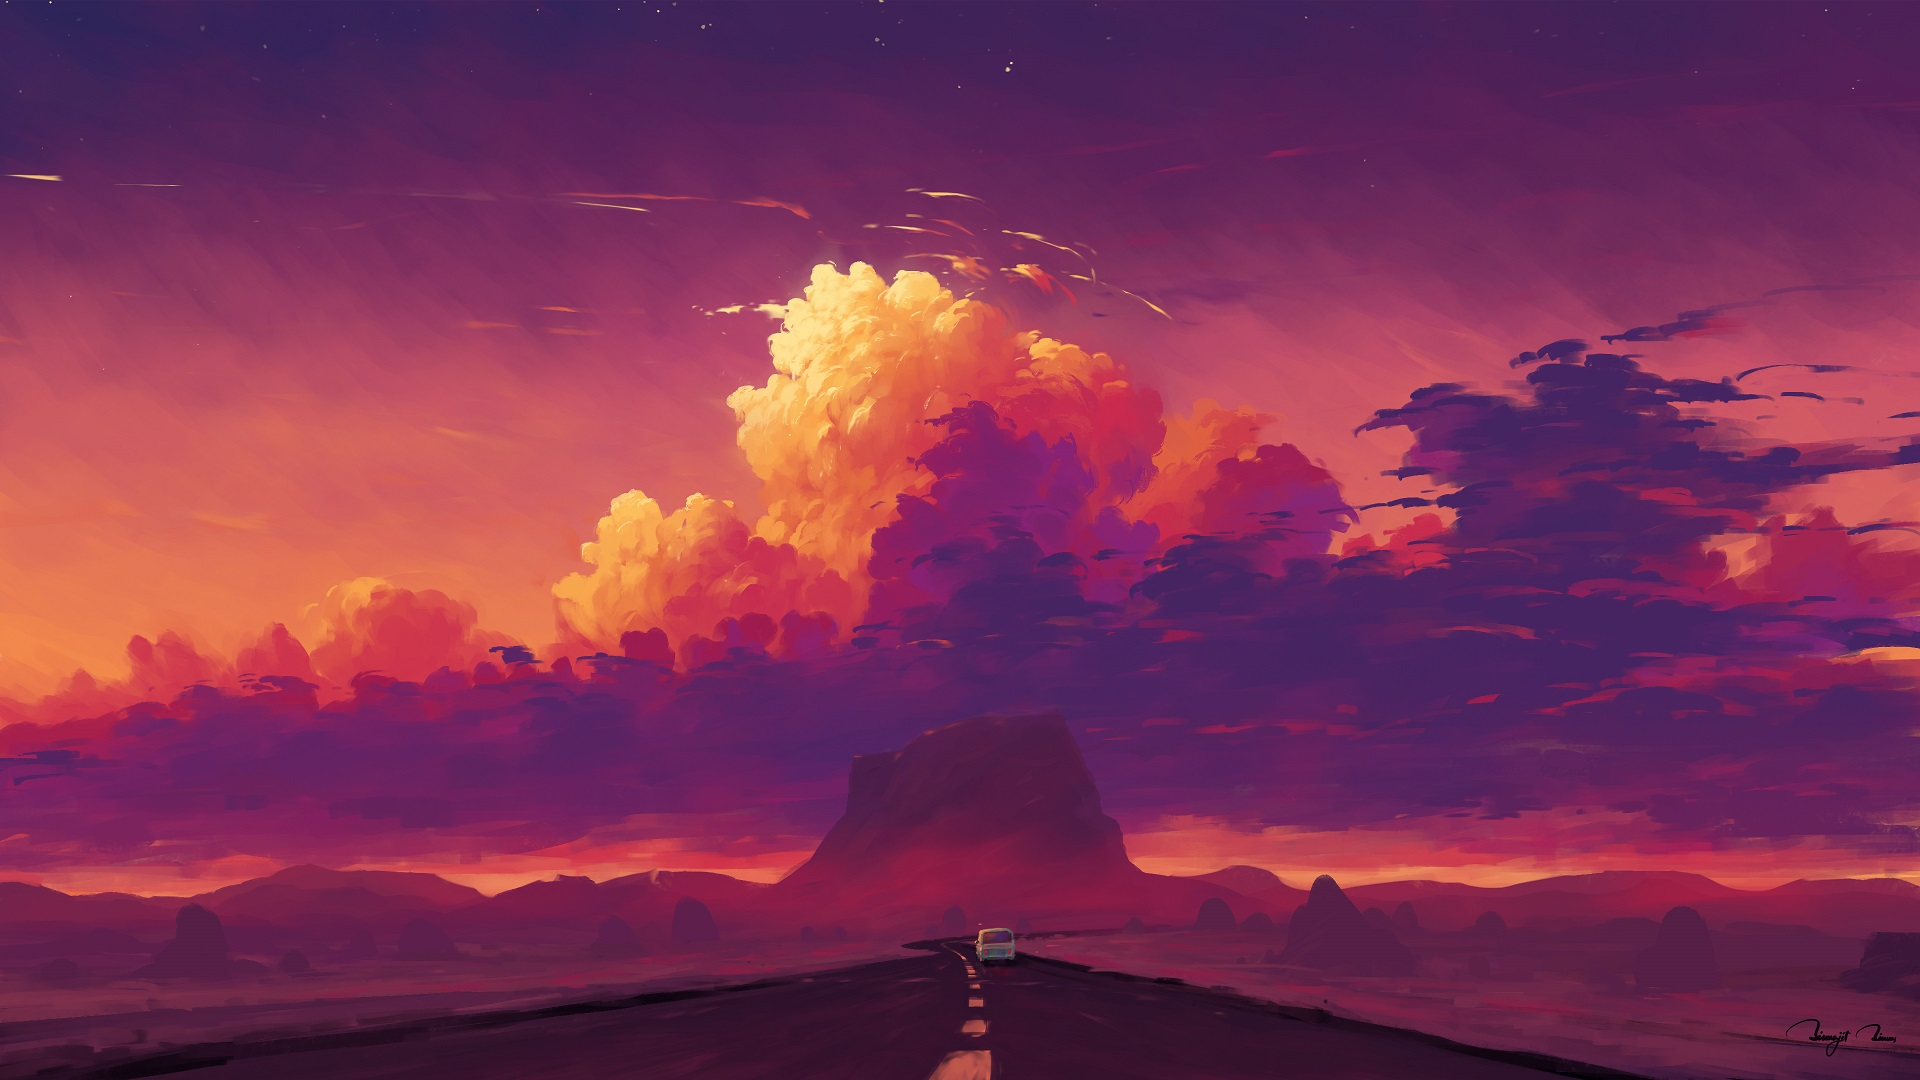 General 1920x1080 digital painting landscape sky clouds car mountains BisBiswas